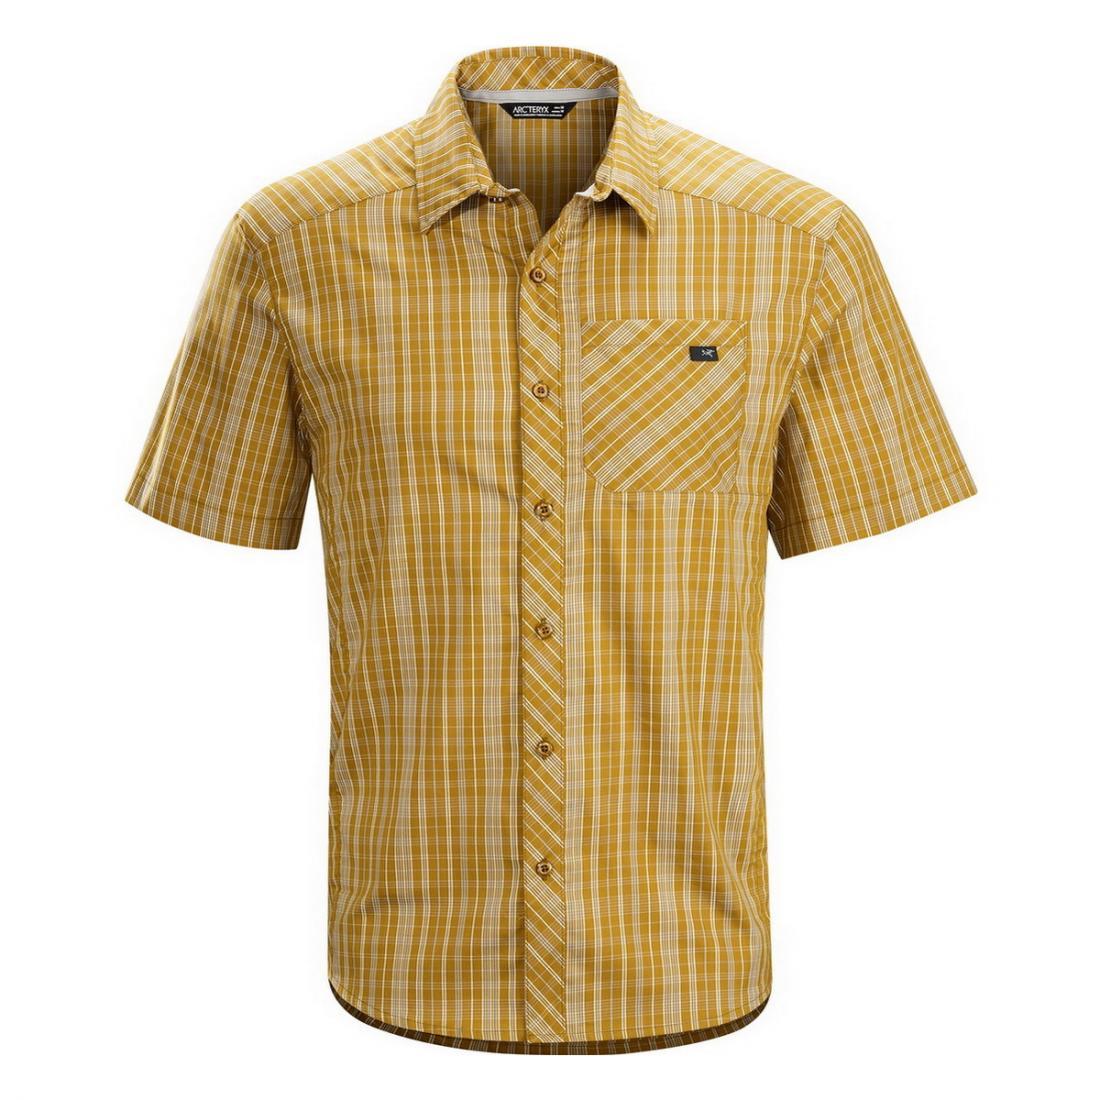 Рубашка Peakline Shirt SS муж.Рубашки<br><br><br>Цвет: Коричневый<br>Размер: XL